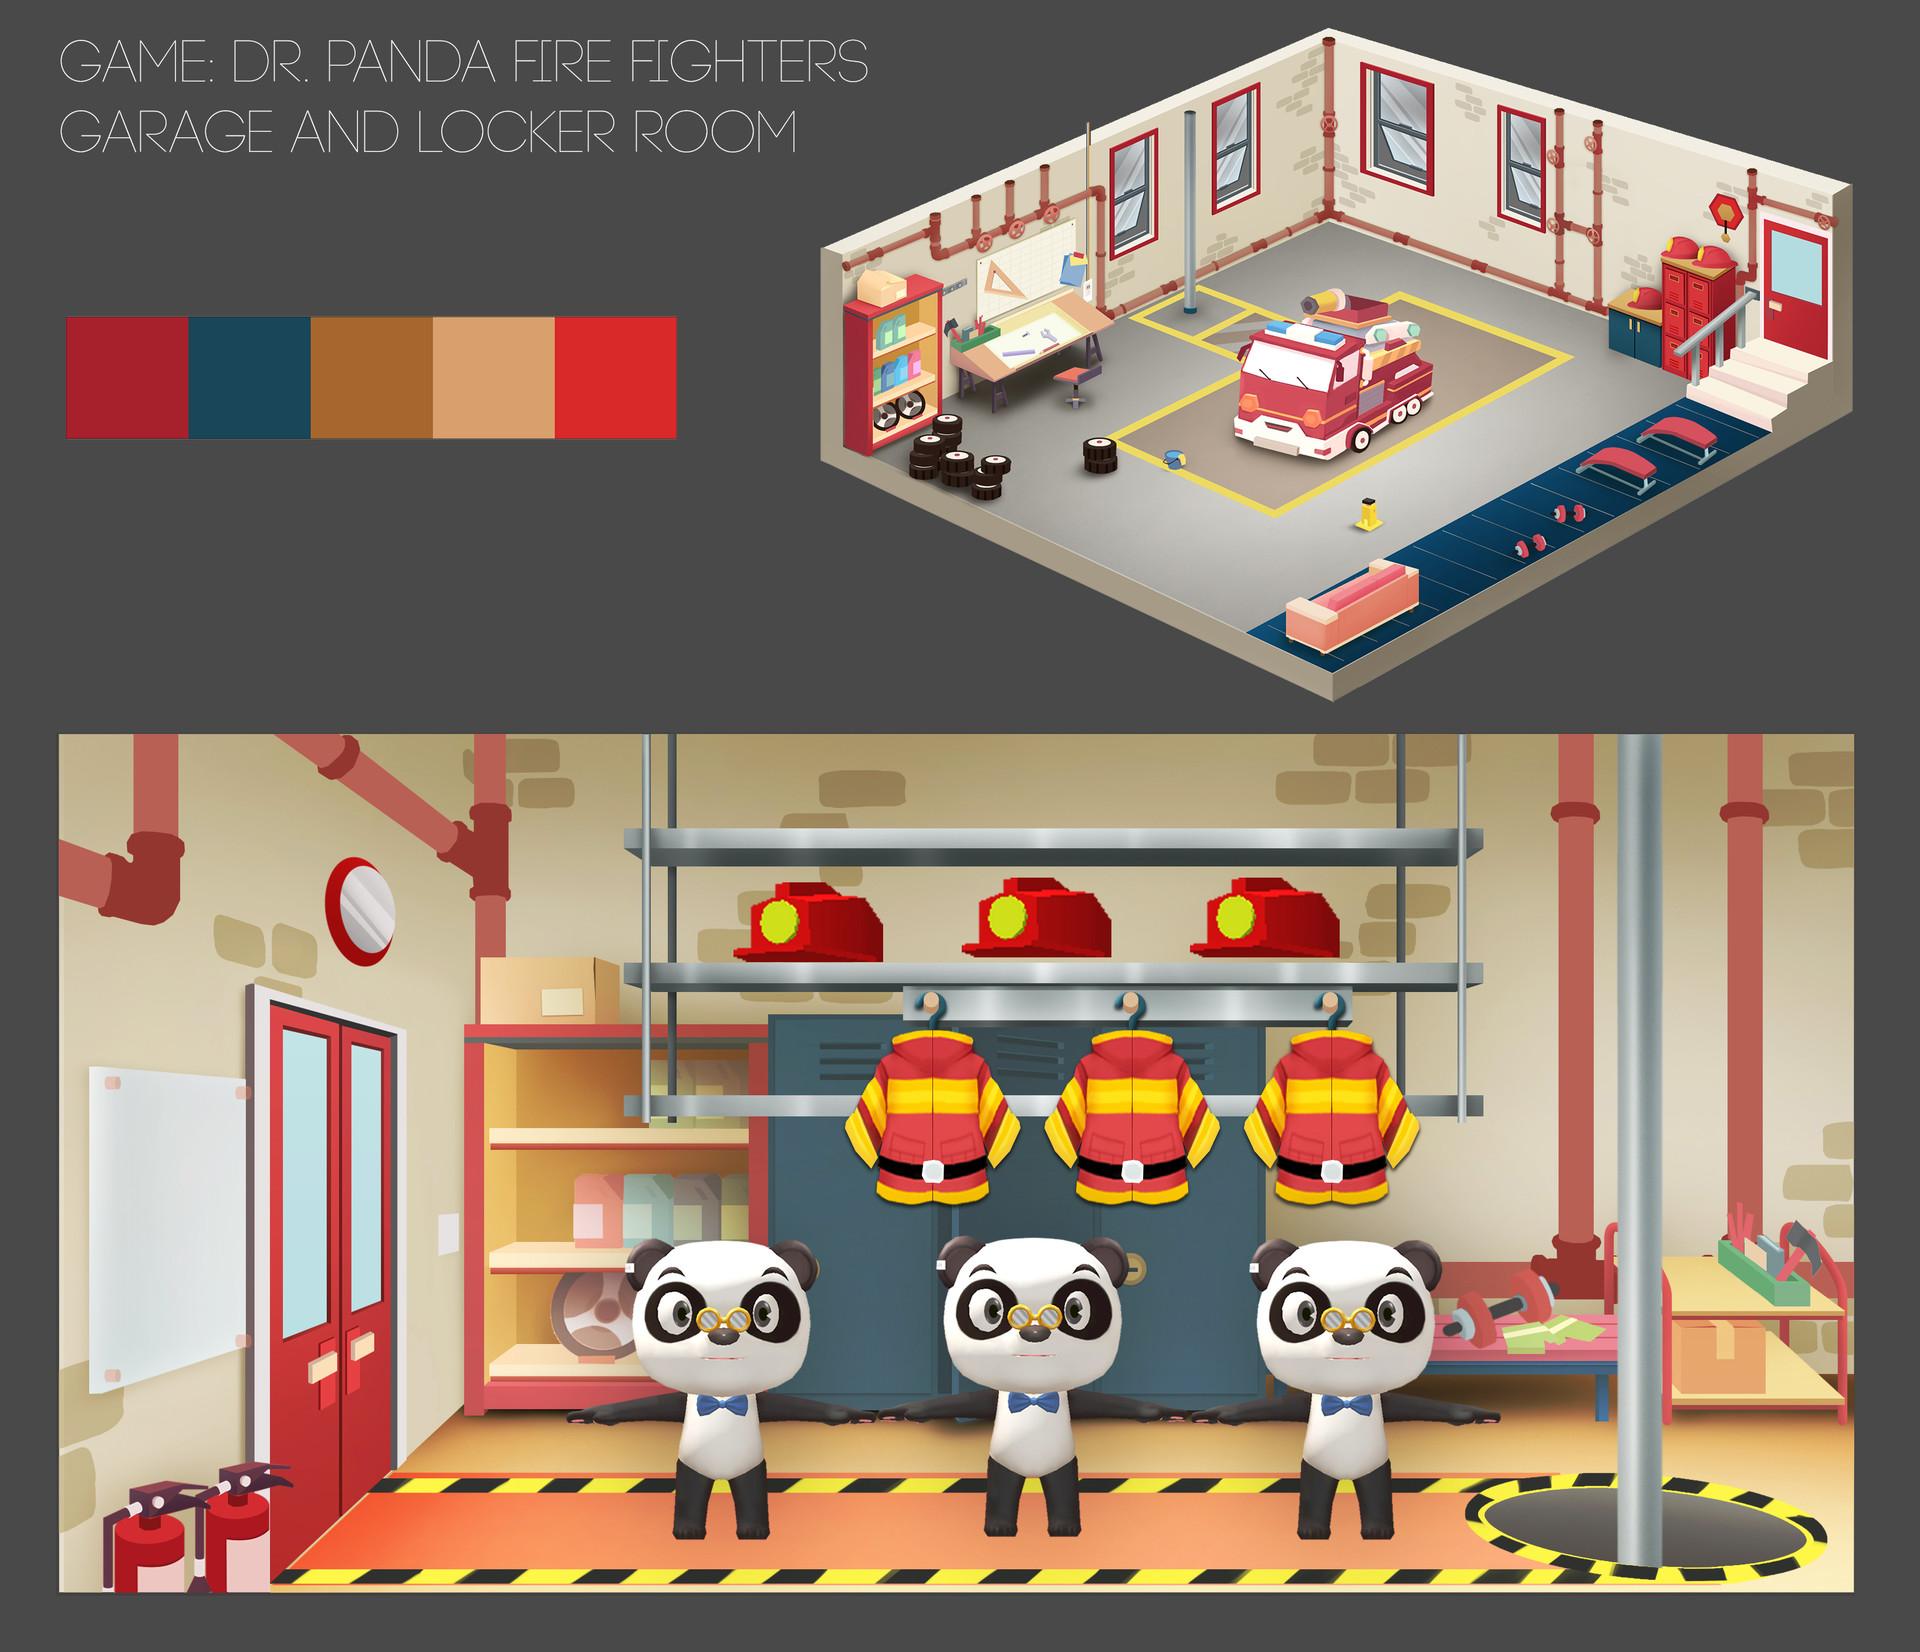 Thu phan artstation dressingroom